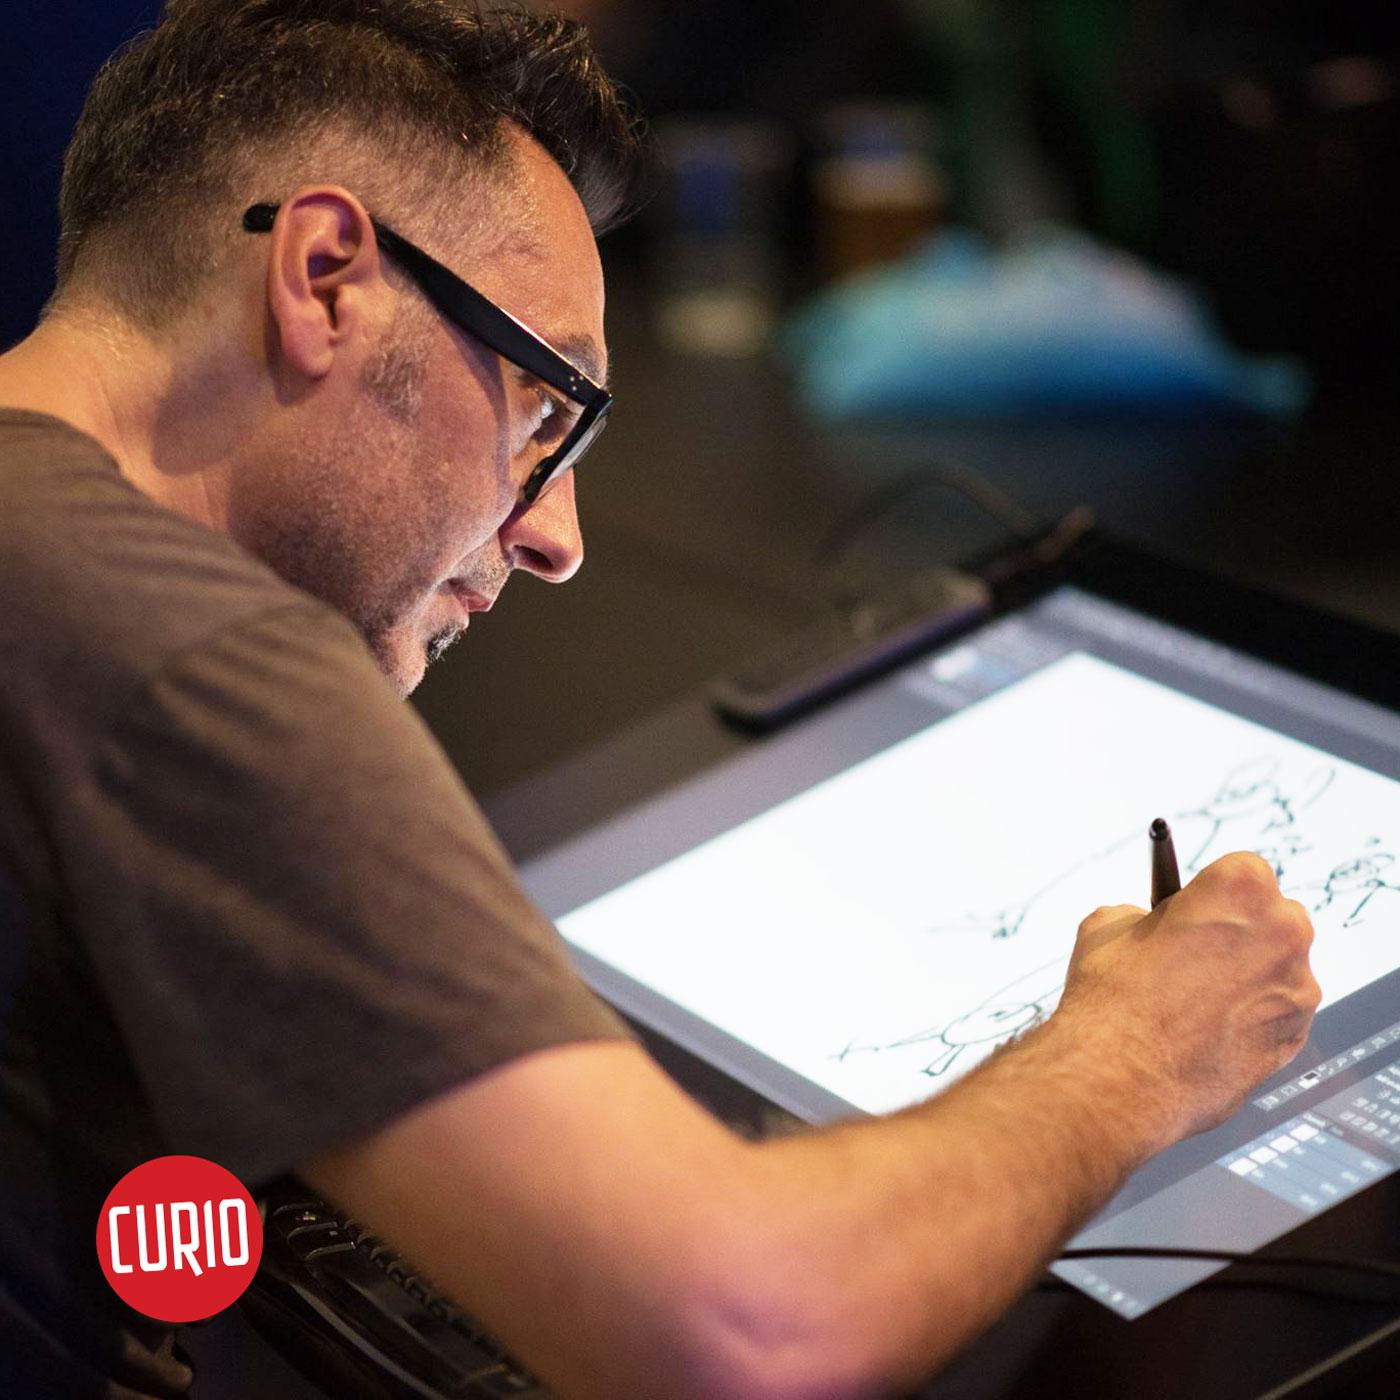 Cesare Asaro of Curio & Co. drawing on Cintiq at Pixel Vienna 2017